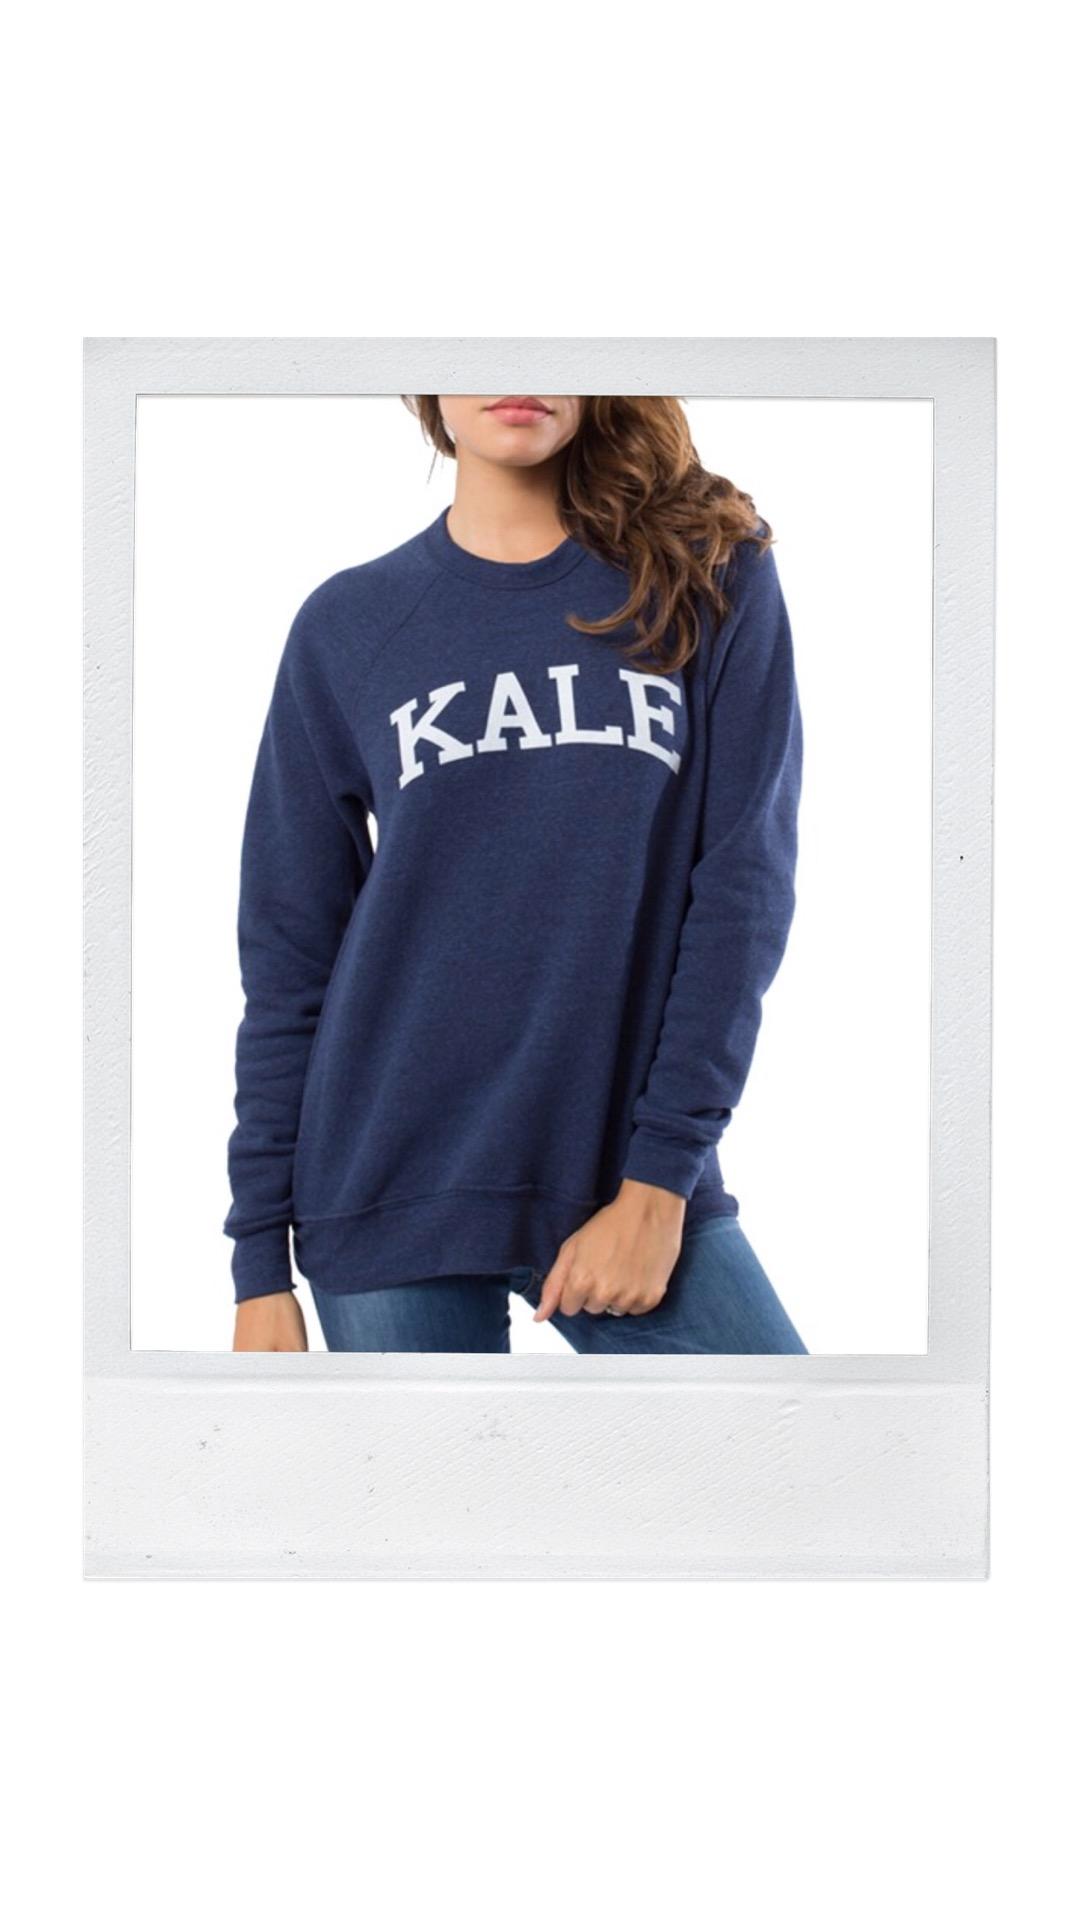 kale sweater.jpeg